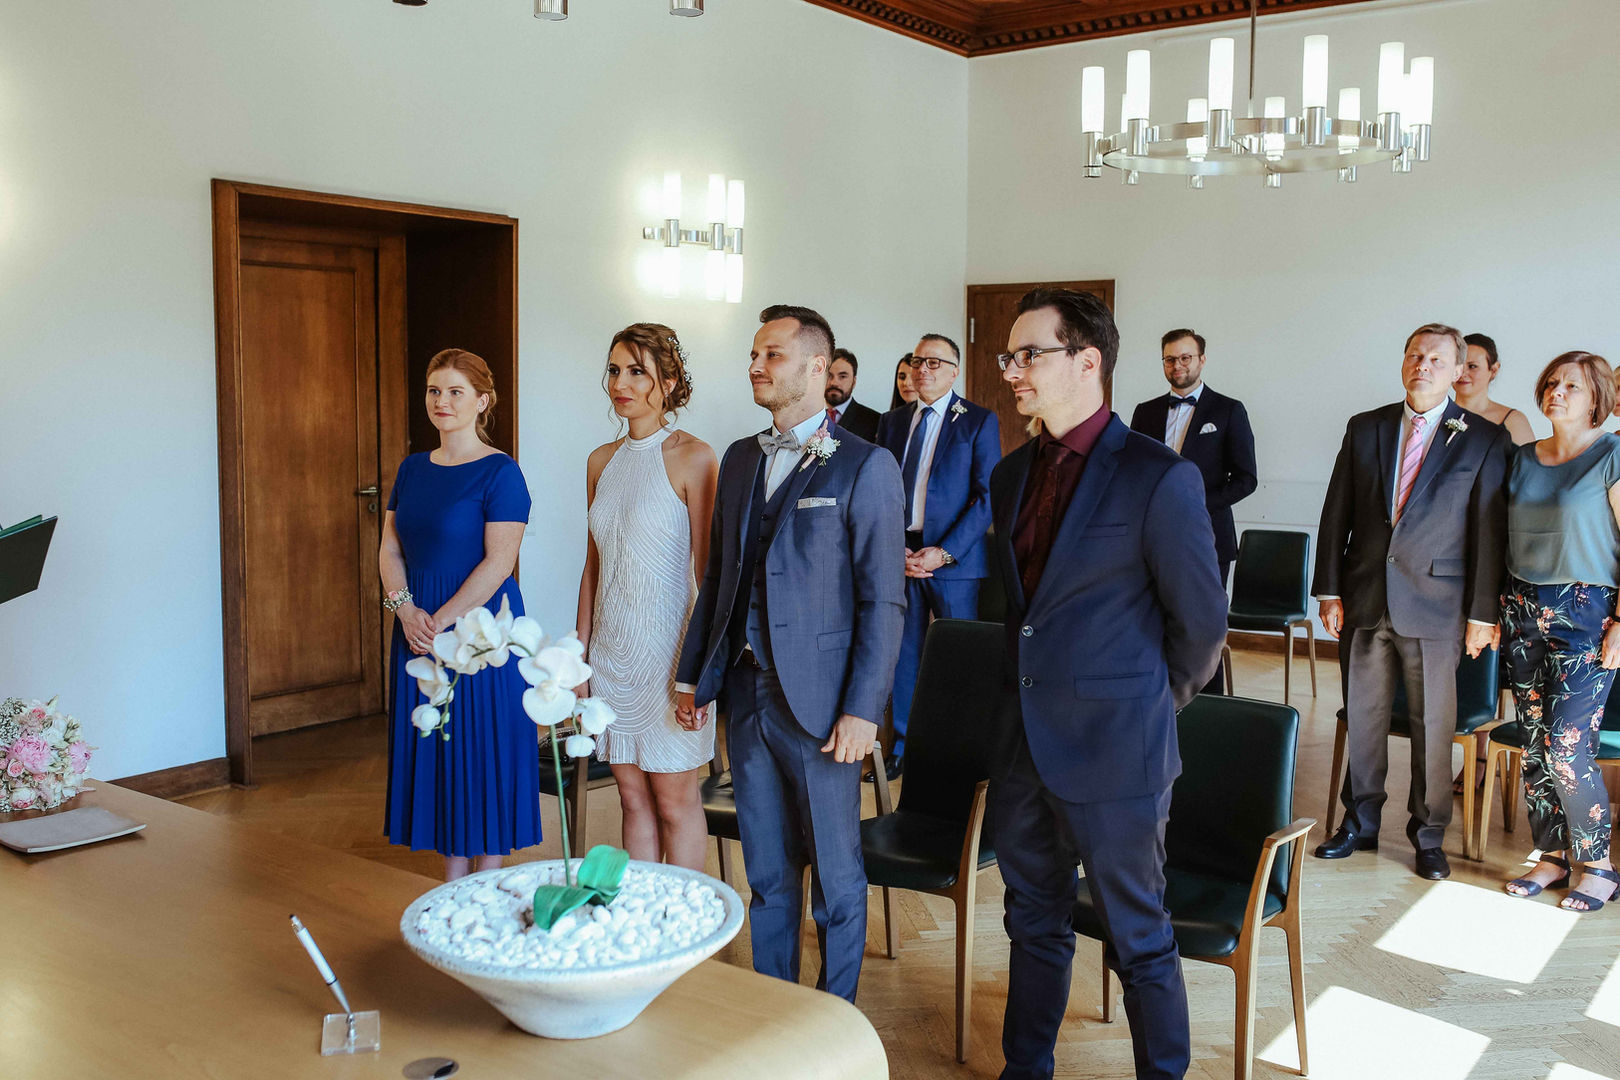 Hochzeit im l'Arrivée HOTEL & SPA00010.j